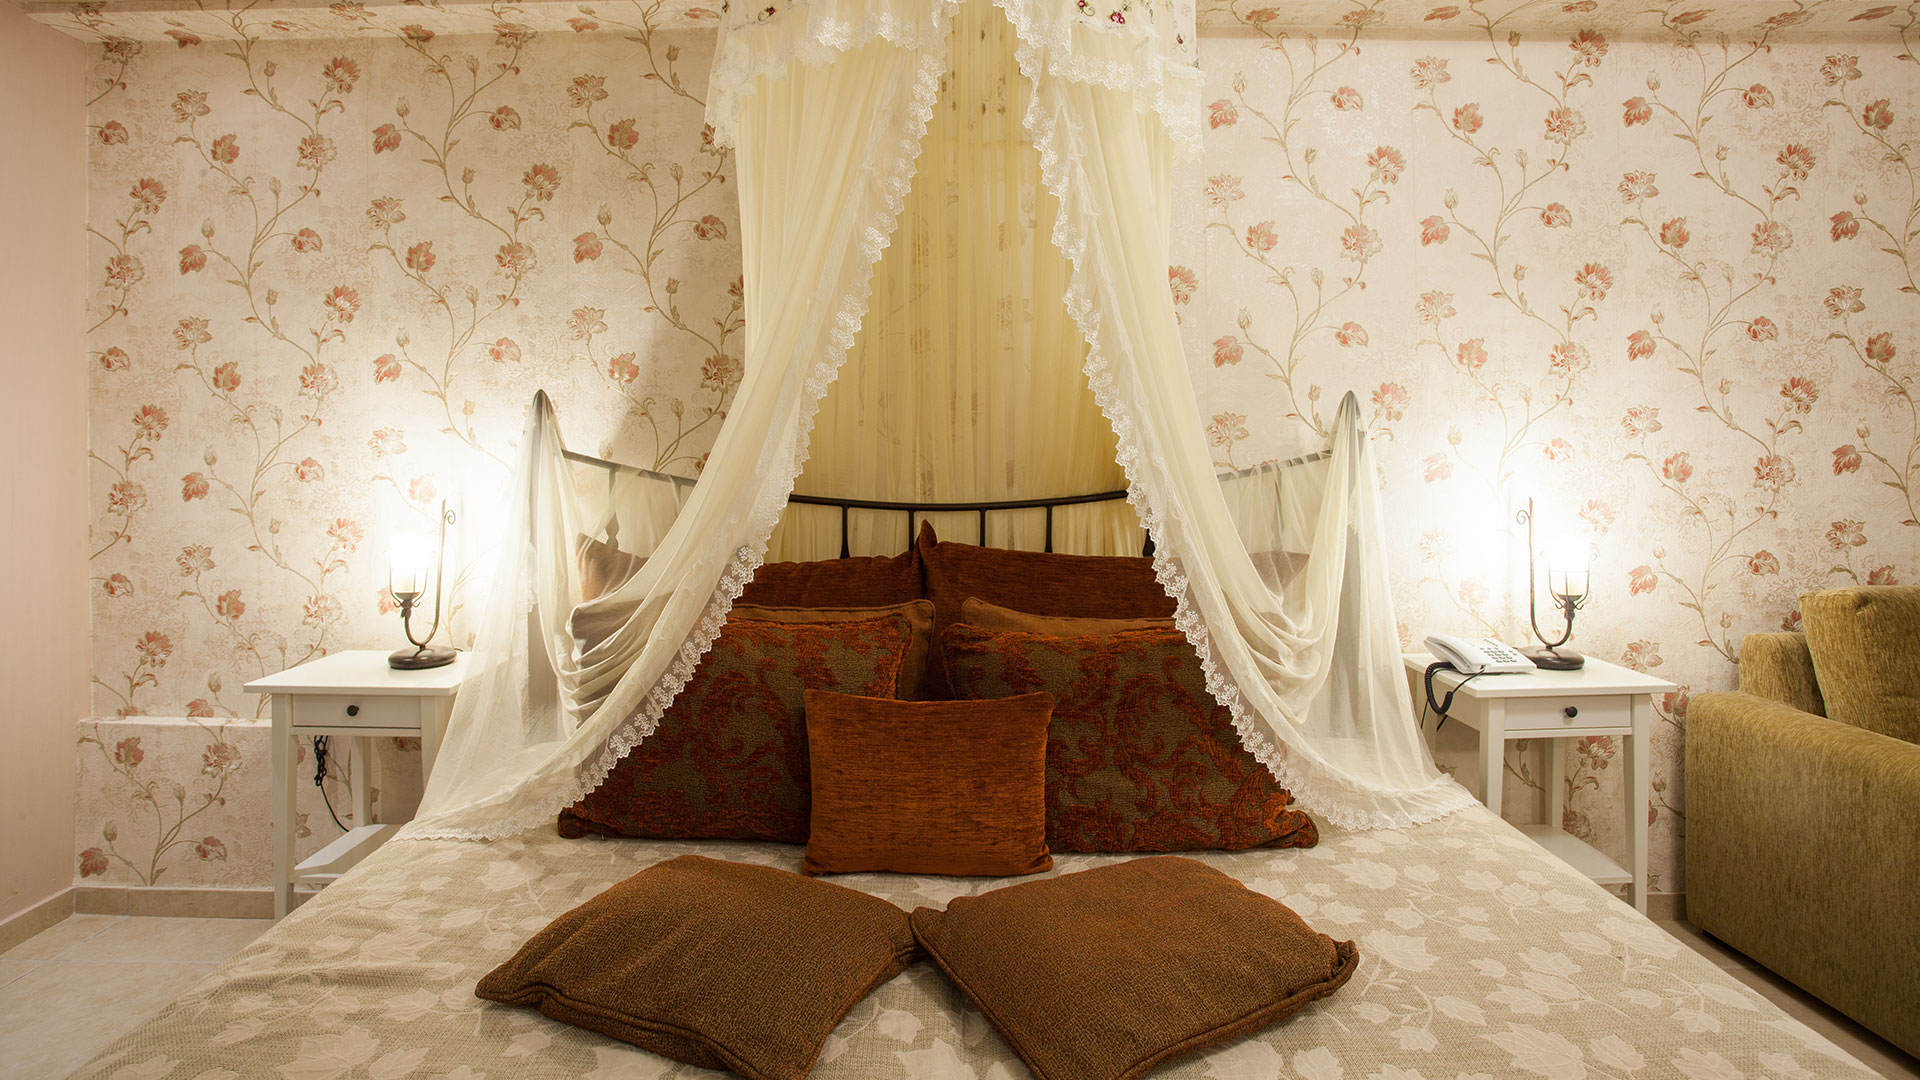 Achtis Hotel has luxury 4 star hotel suites in Afitos, Halkidiki.